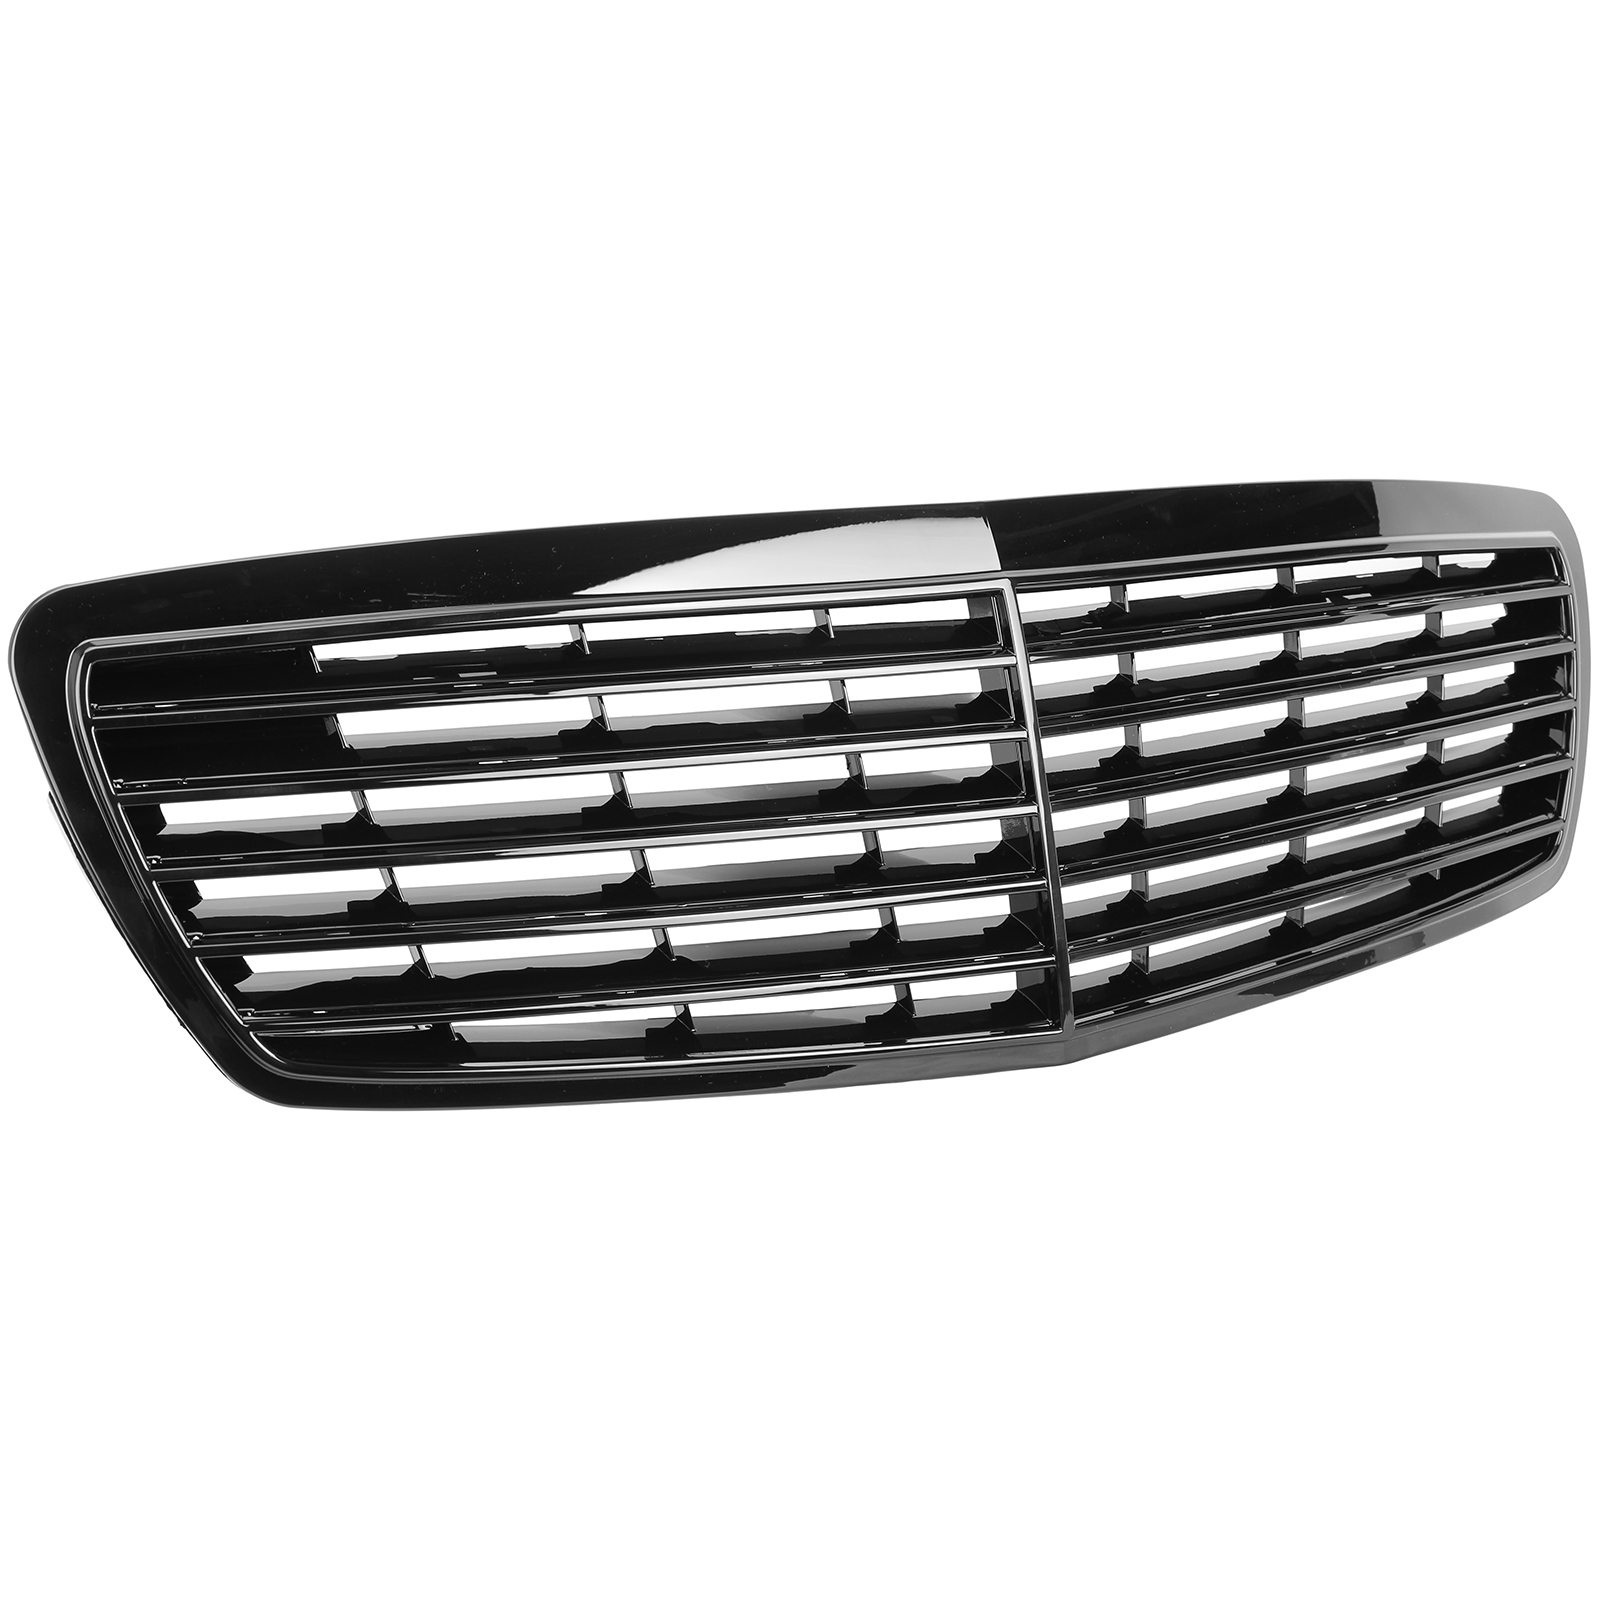 Kühlergrill Sportgrill Mercedes Grill W211 S211 06-08 glanz schwarz